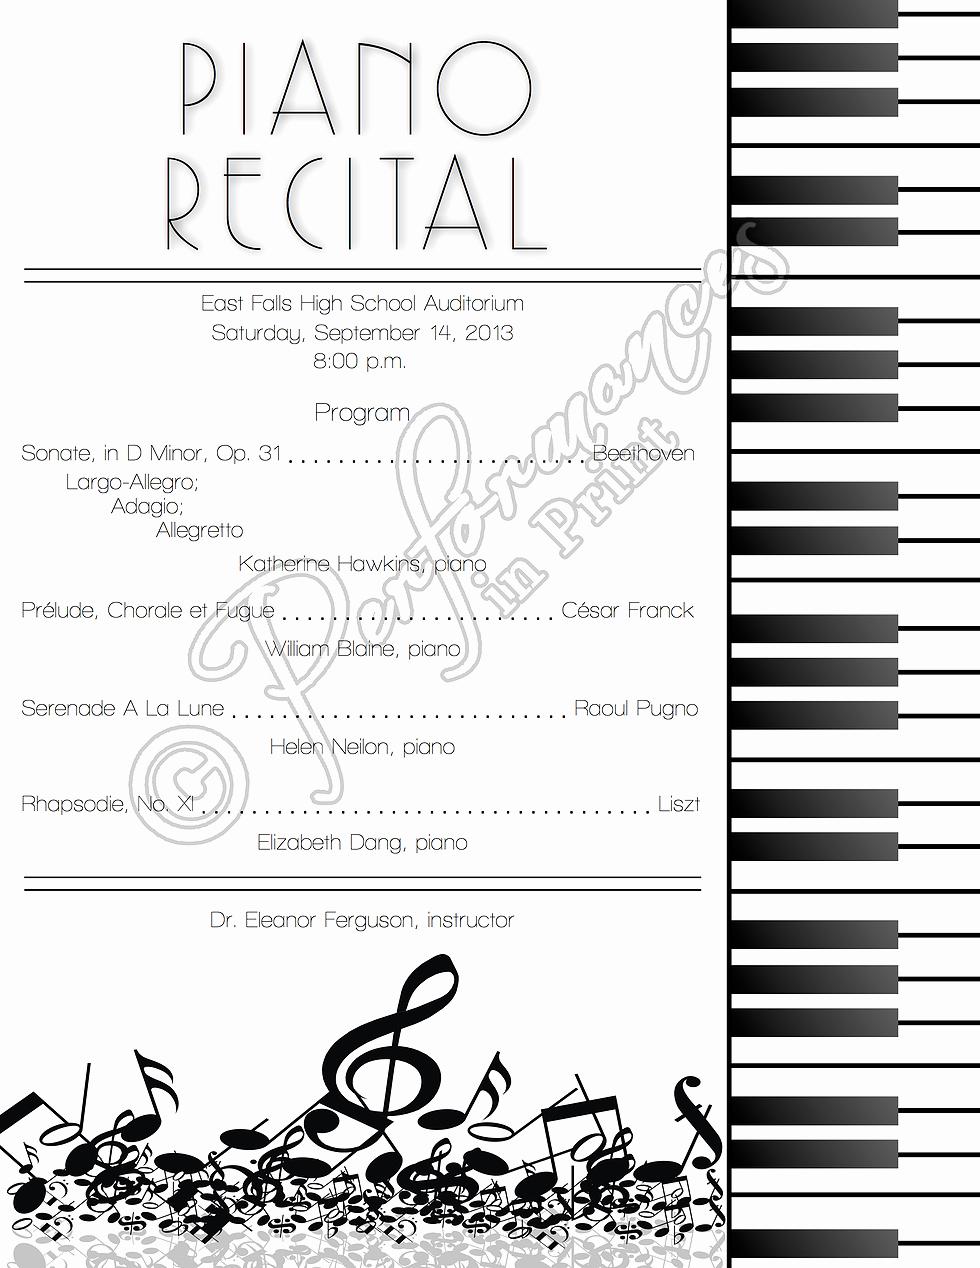 Concert Program Template Free Beautiful Piano Recital Concert Music Program